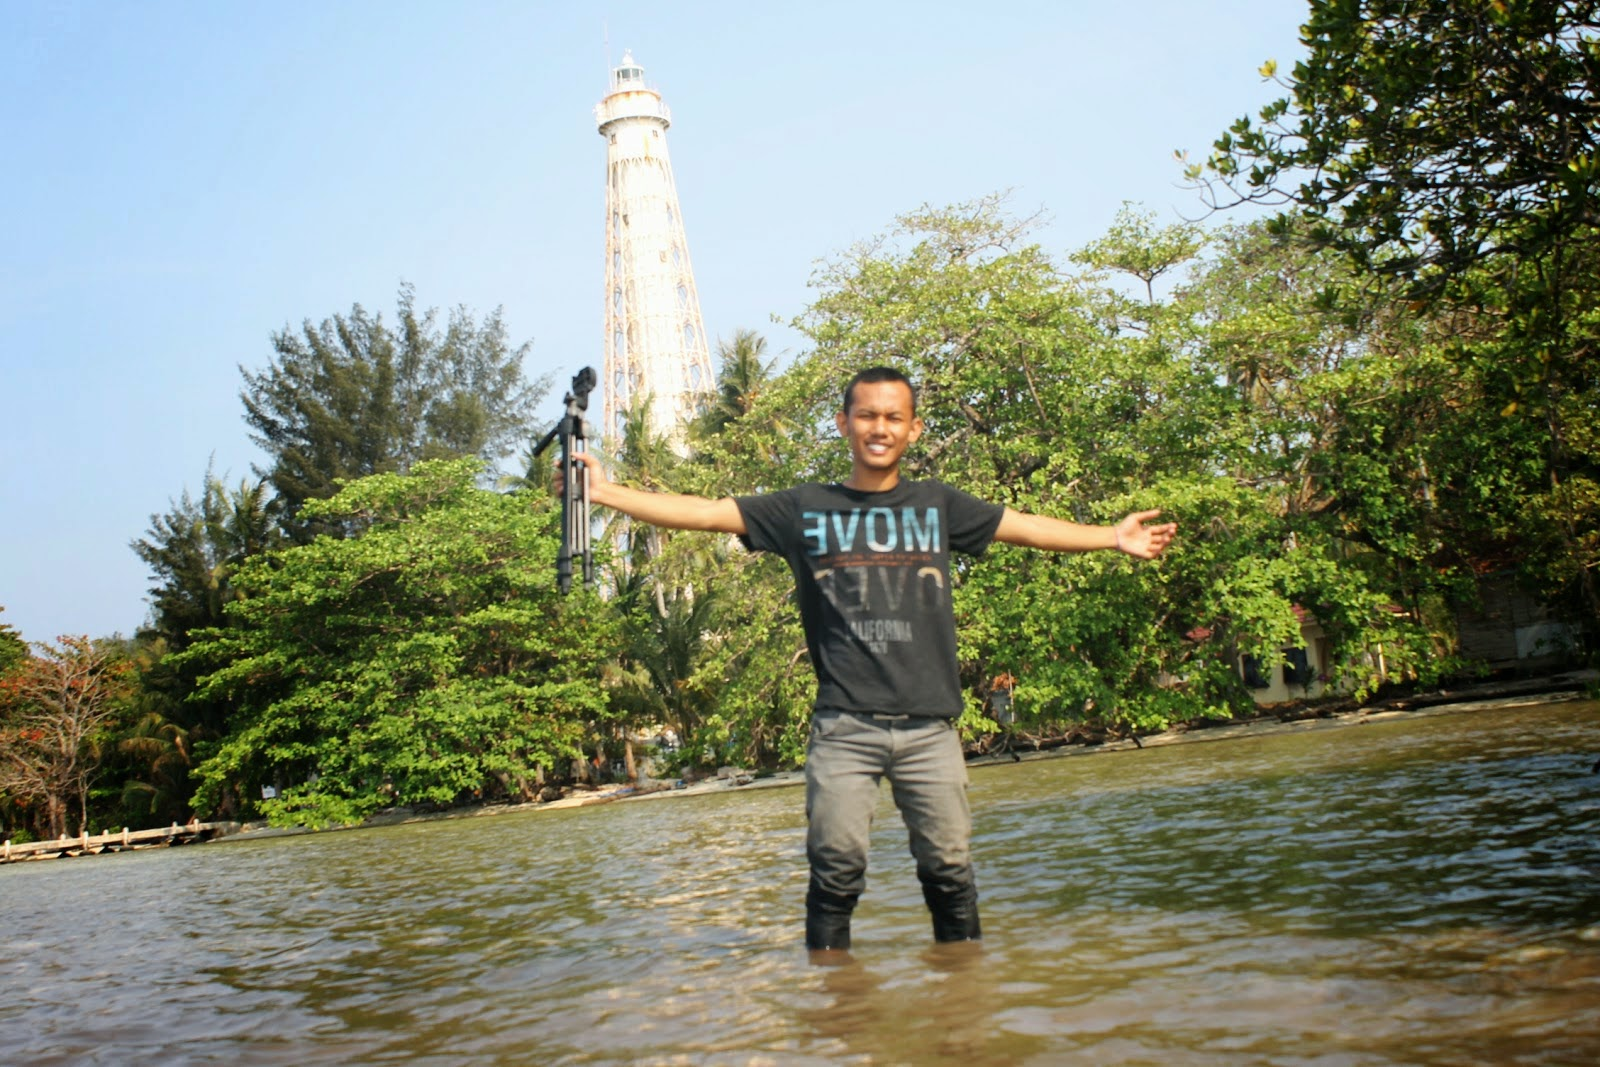 Obyek Wisata Menarik Di Indramayu Bloggermangga Komunitas Blogger Indramayu